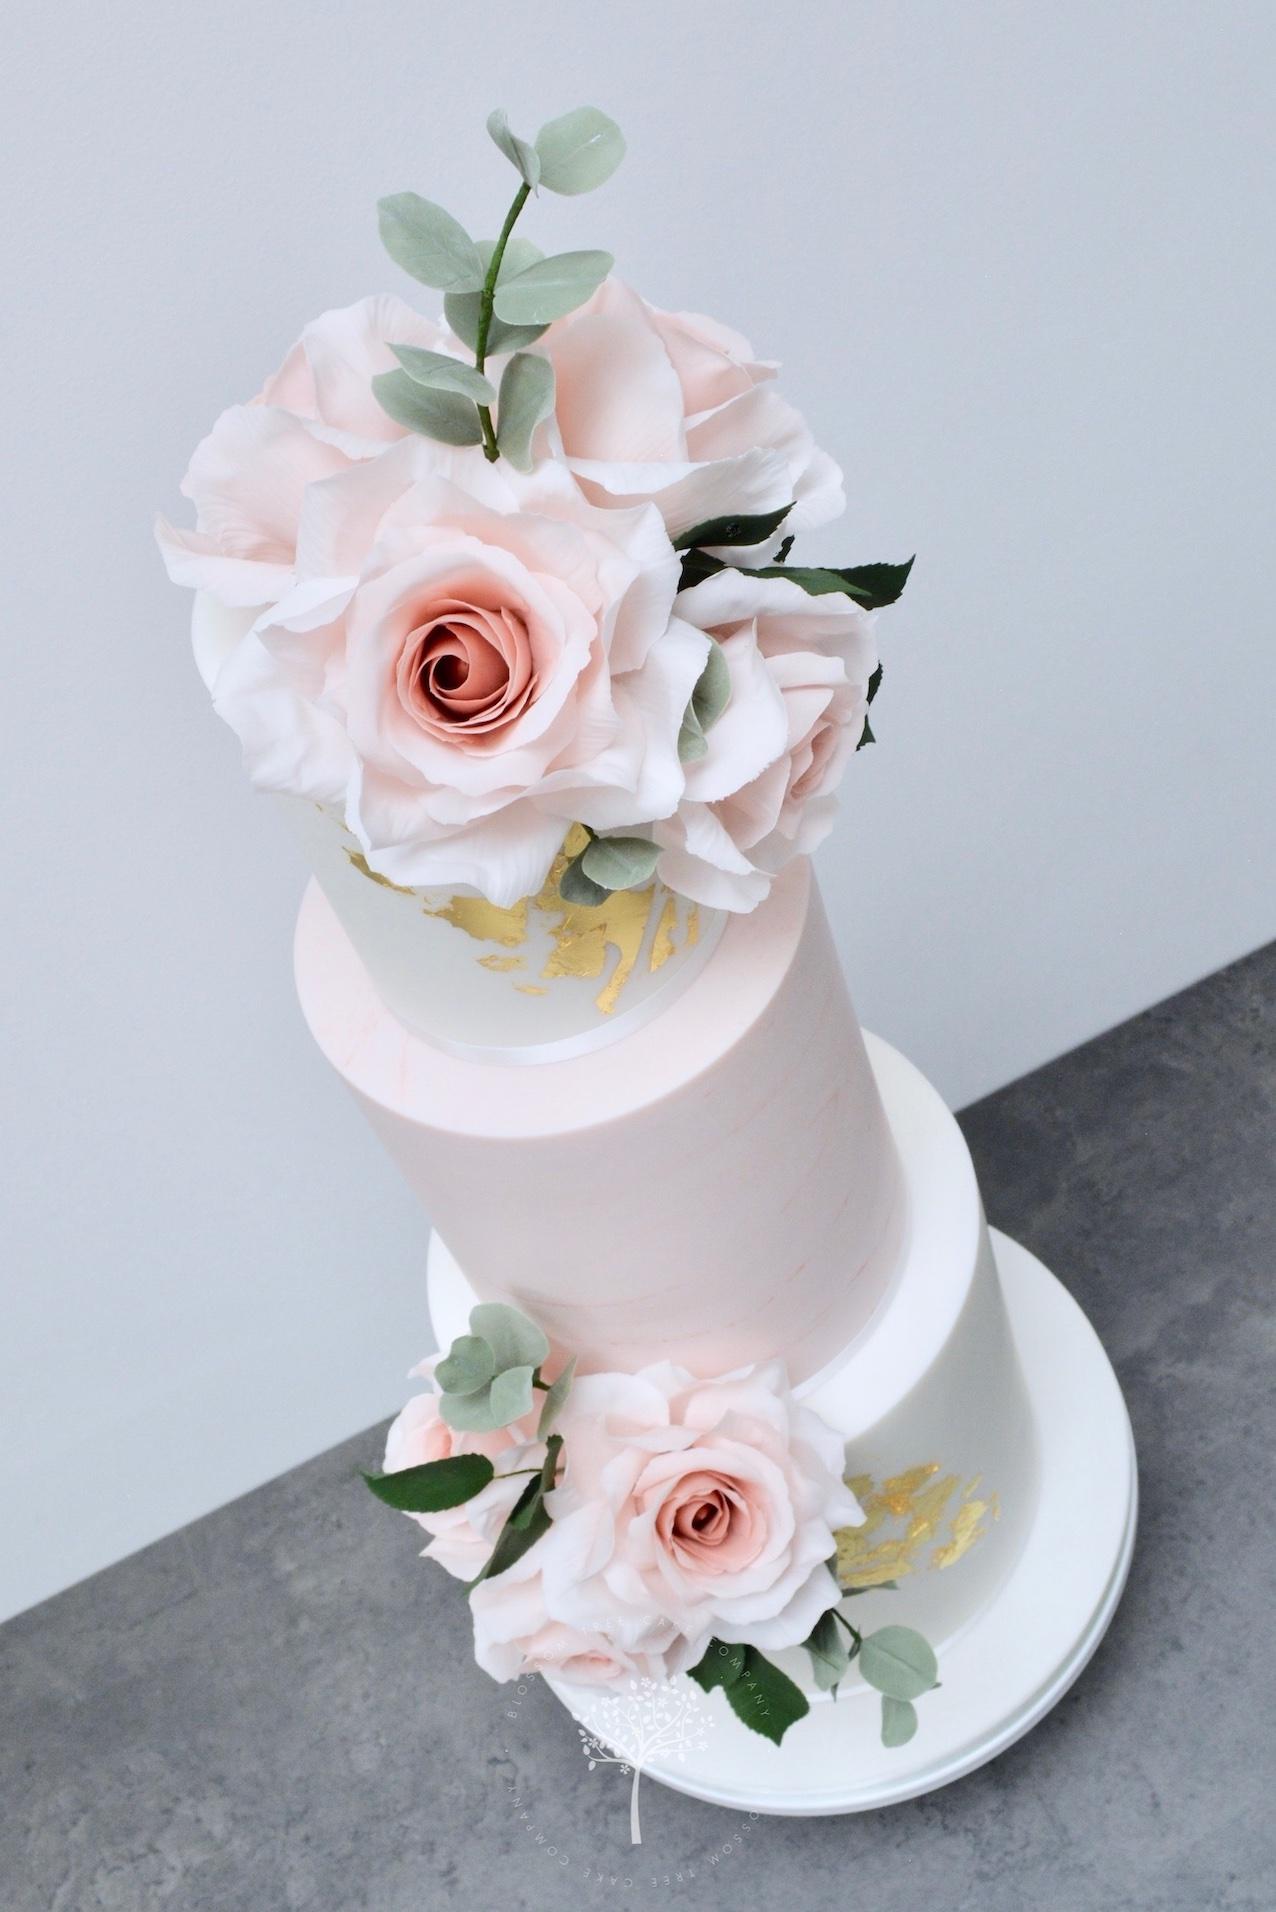 Dusky Pink & Gold wedding cake by Blossom Tree Cake Company Harrogate North Yorkshire - angle.jpg